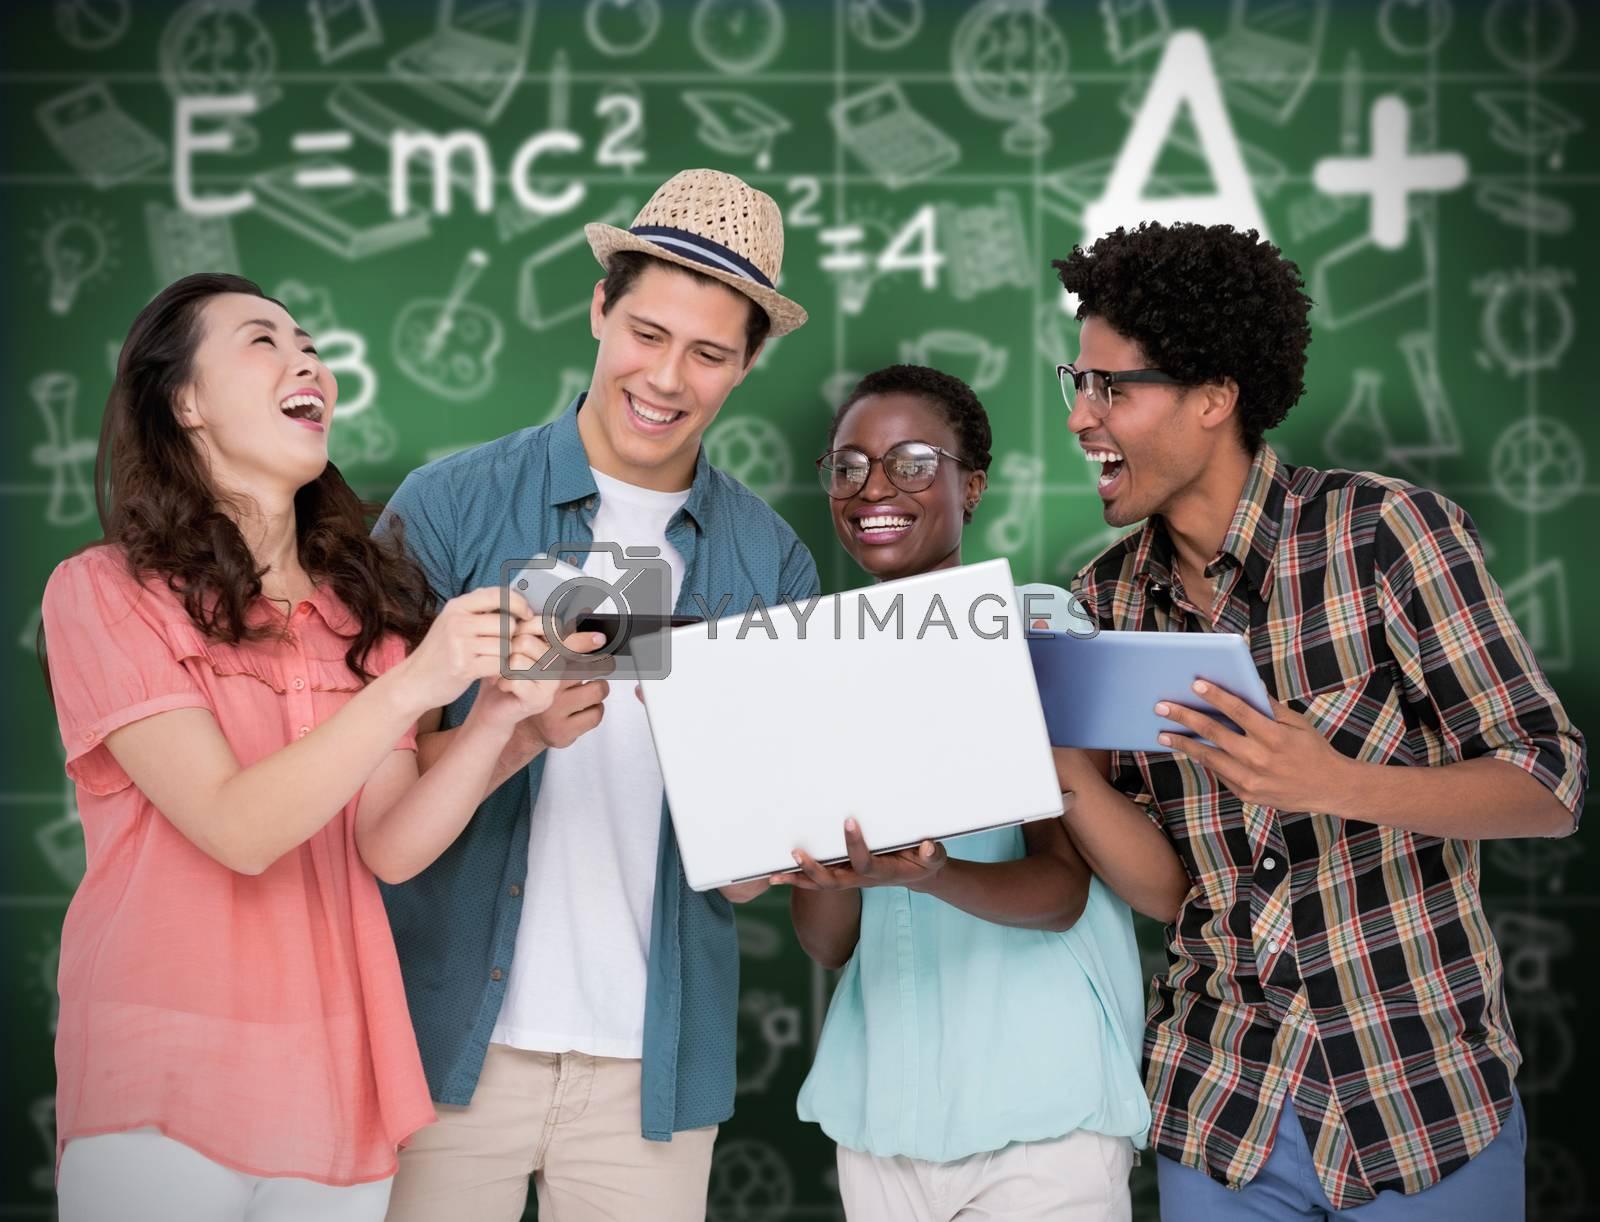 Stylish friends using their technology against green chalkboard